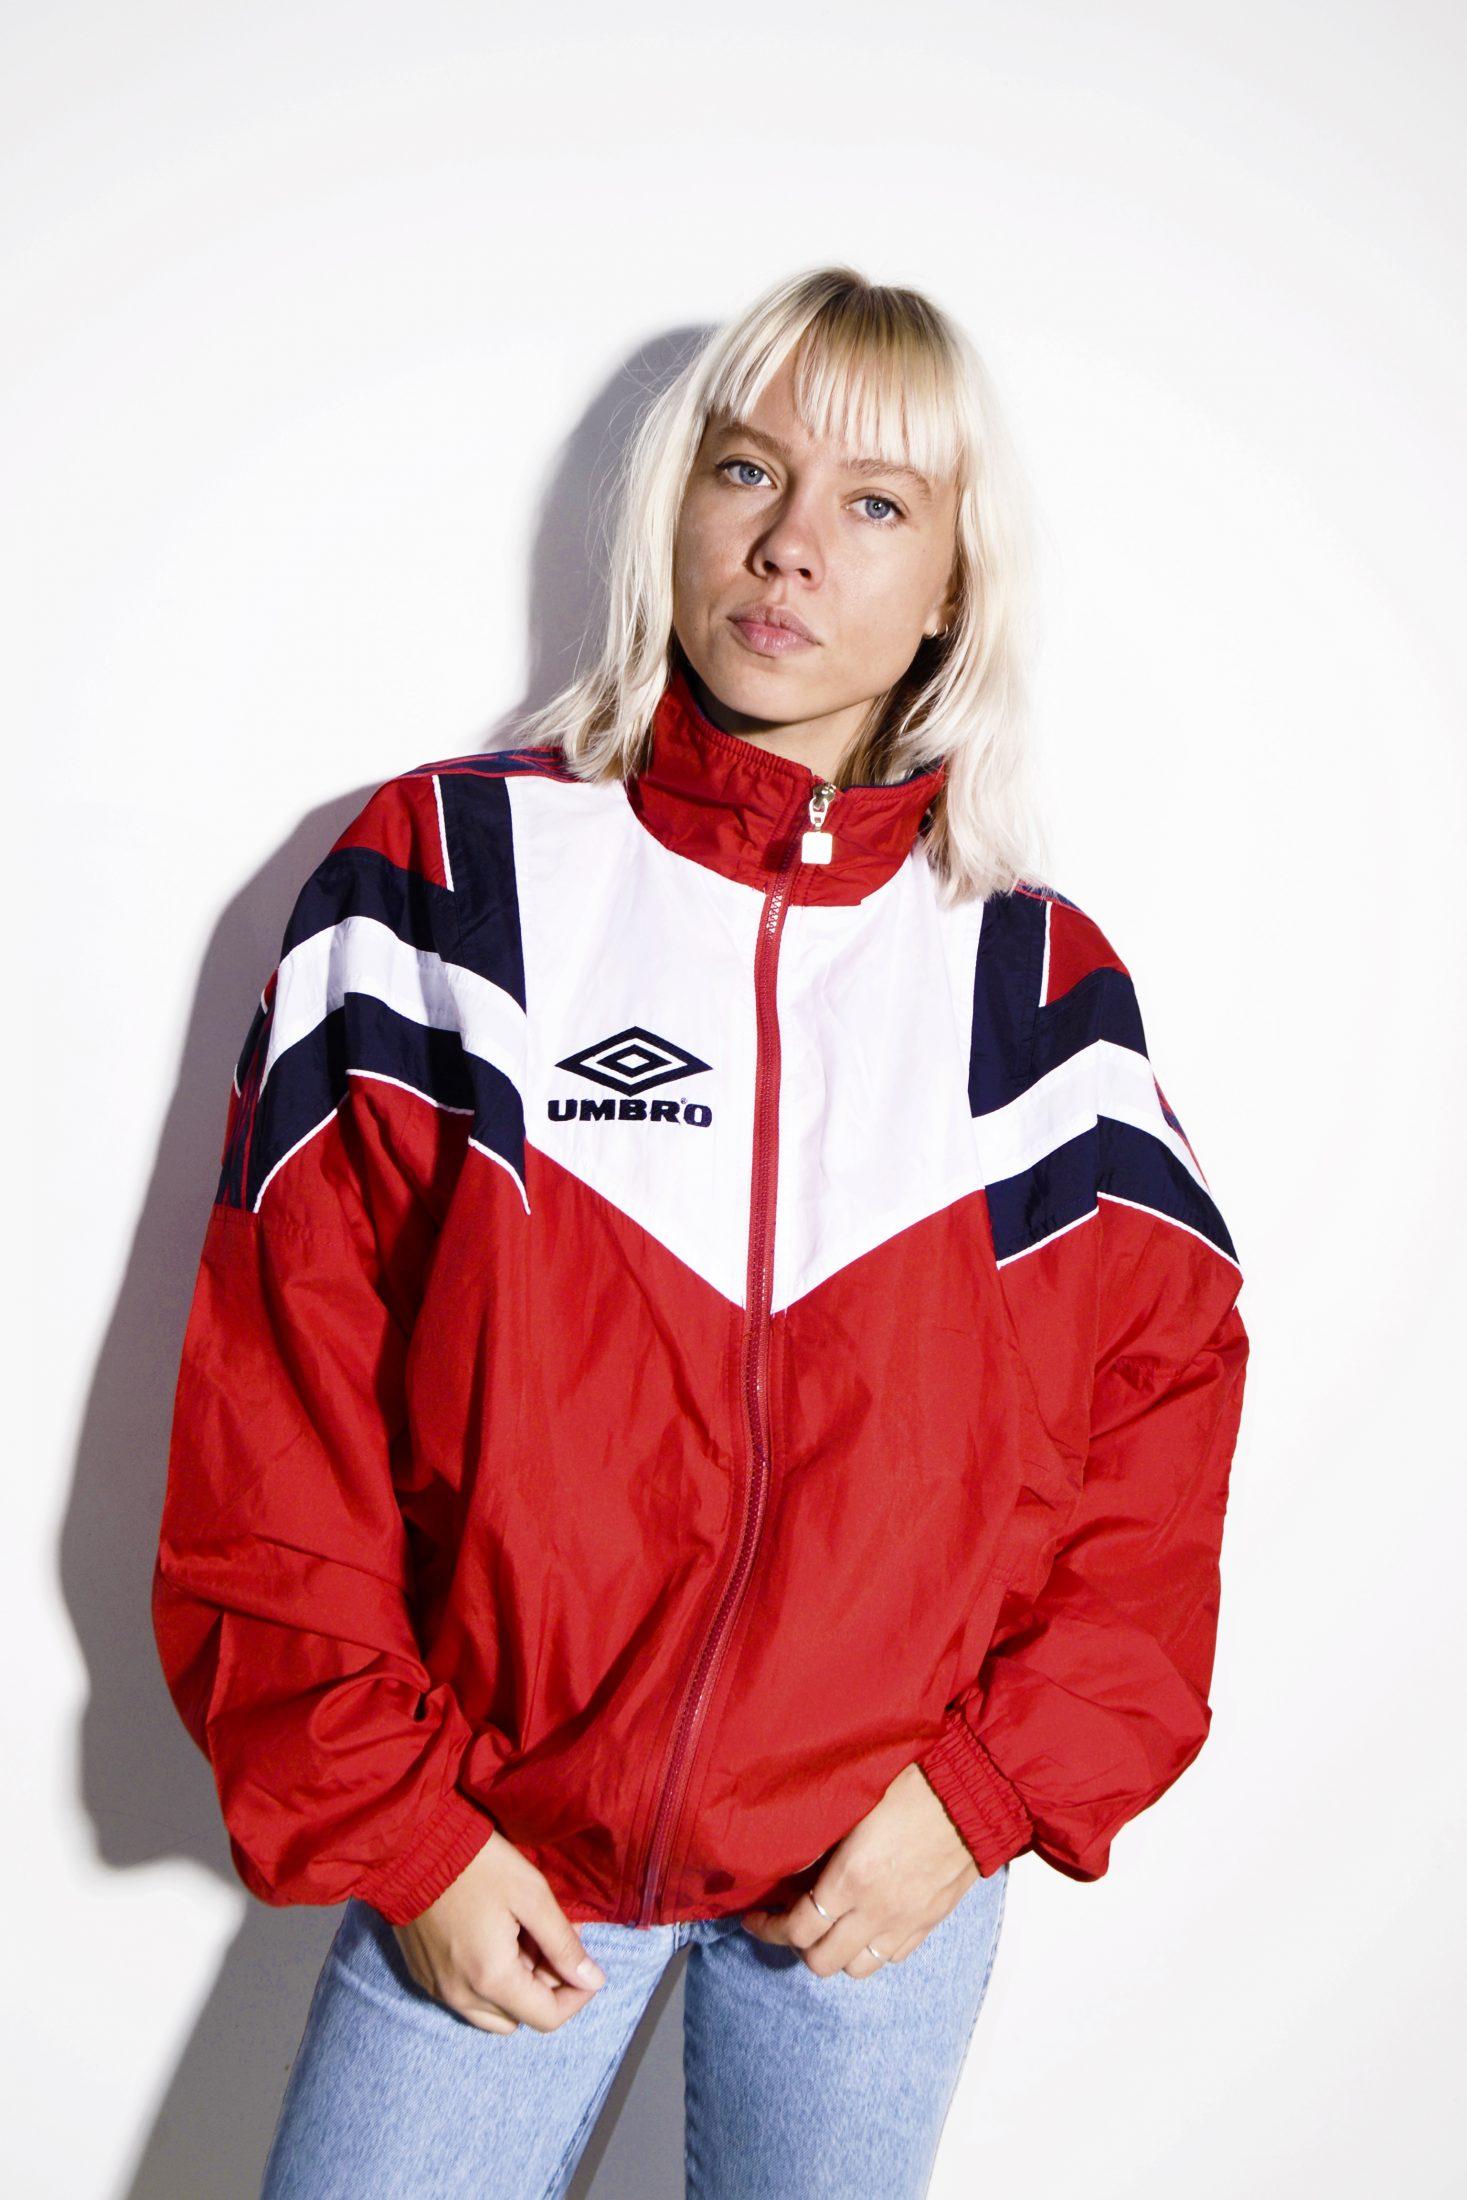 umbro red jacket